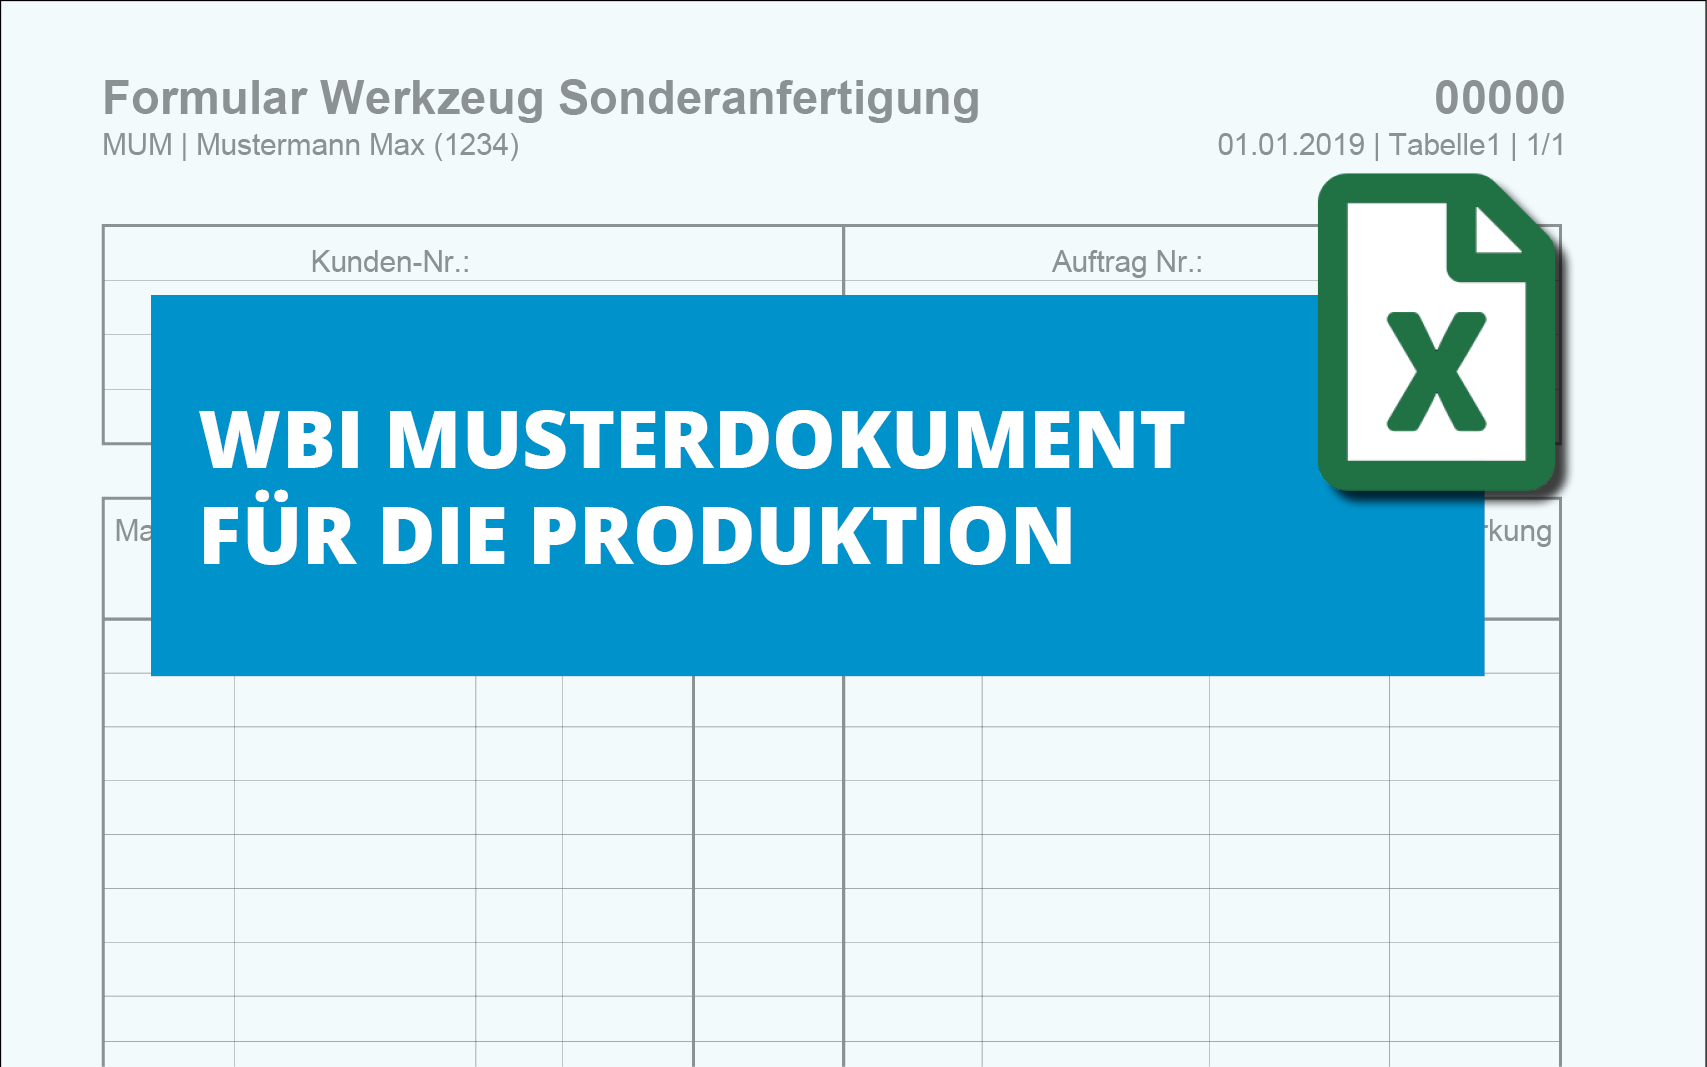 formular-werkzeug-sonderanfertigung